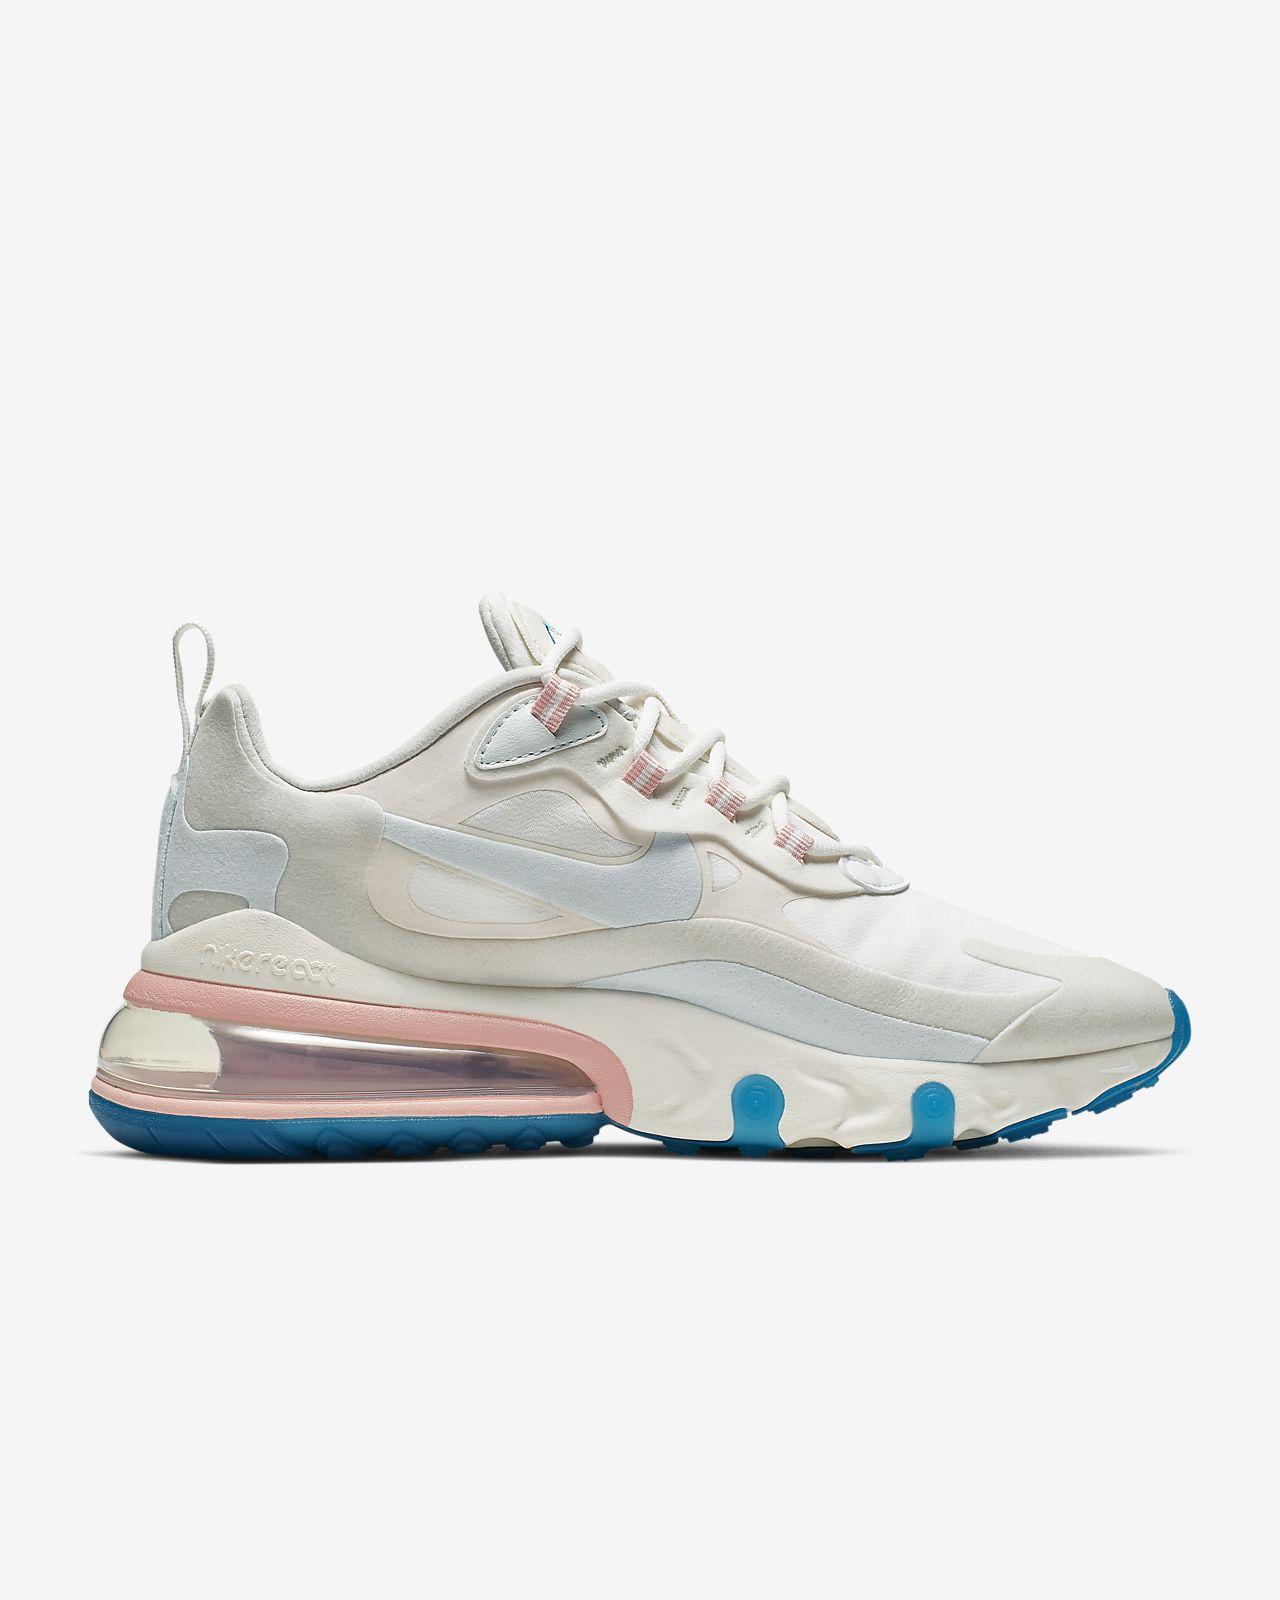 Entdecke Beliebte Ermäßigung Nike Air Max 95 Herren Schuhe